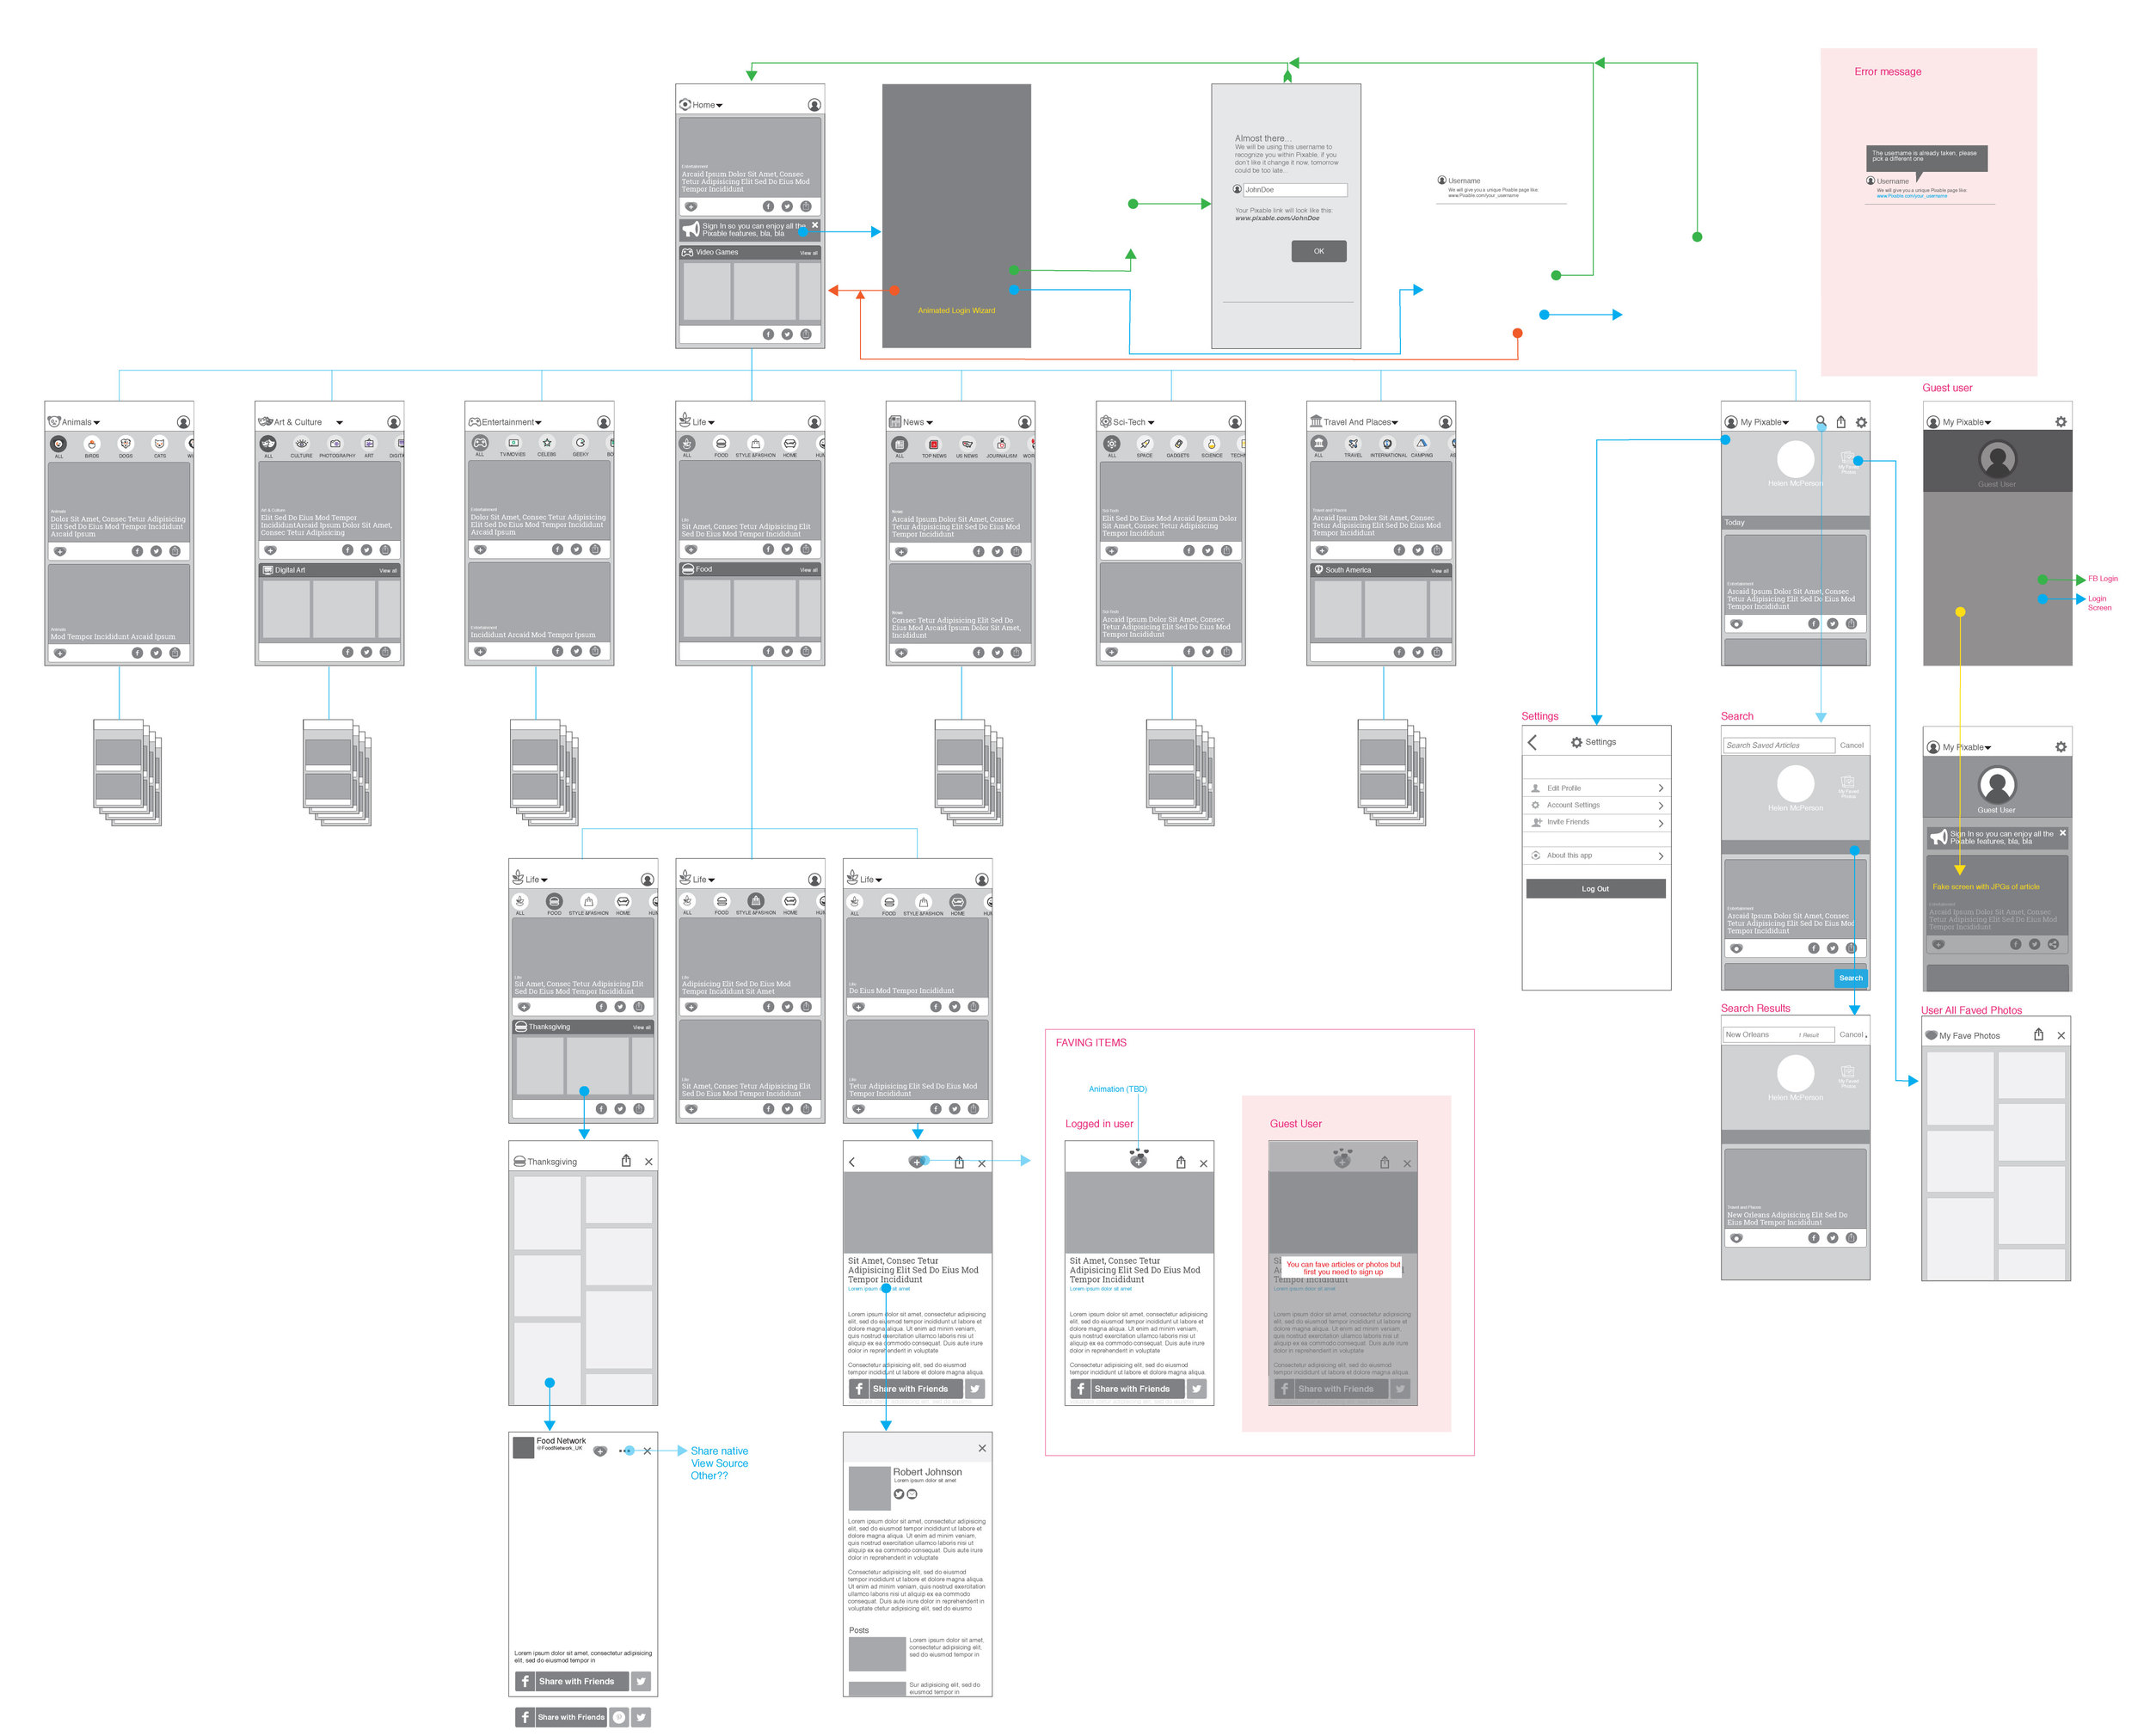 topo-map-Pixable-3.0-iOS.jpg